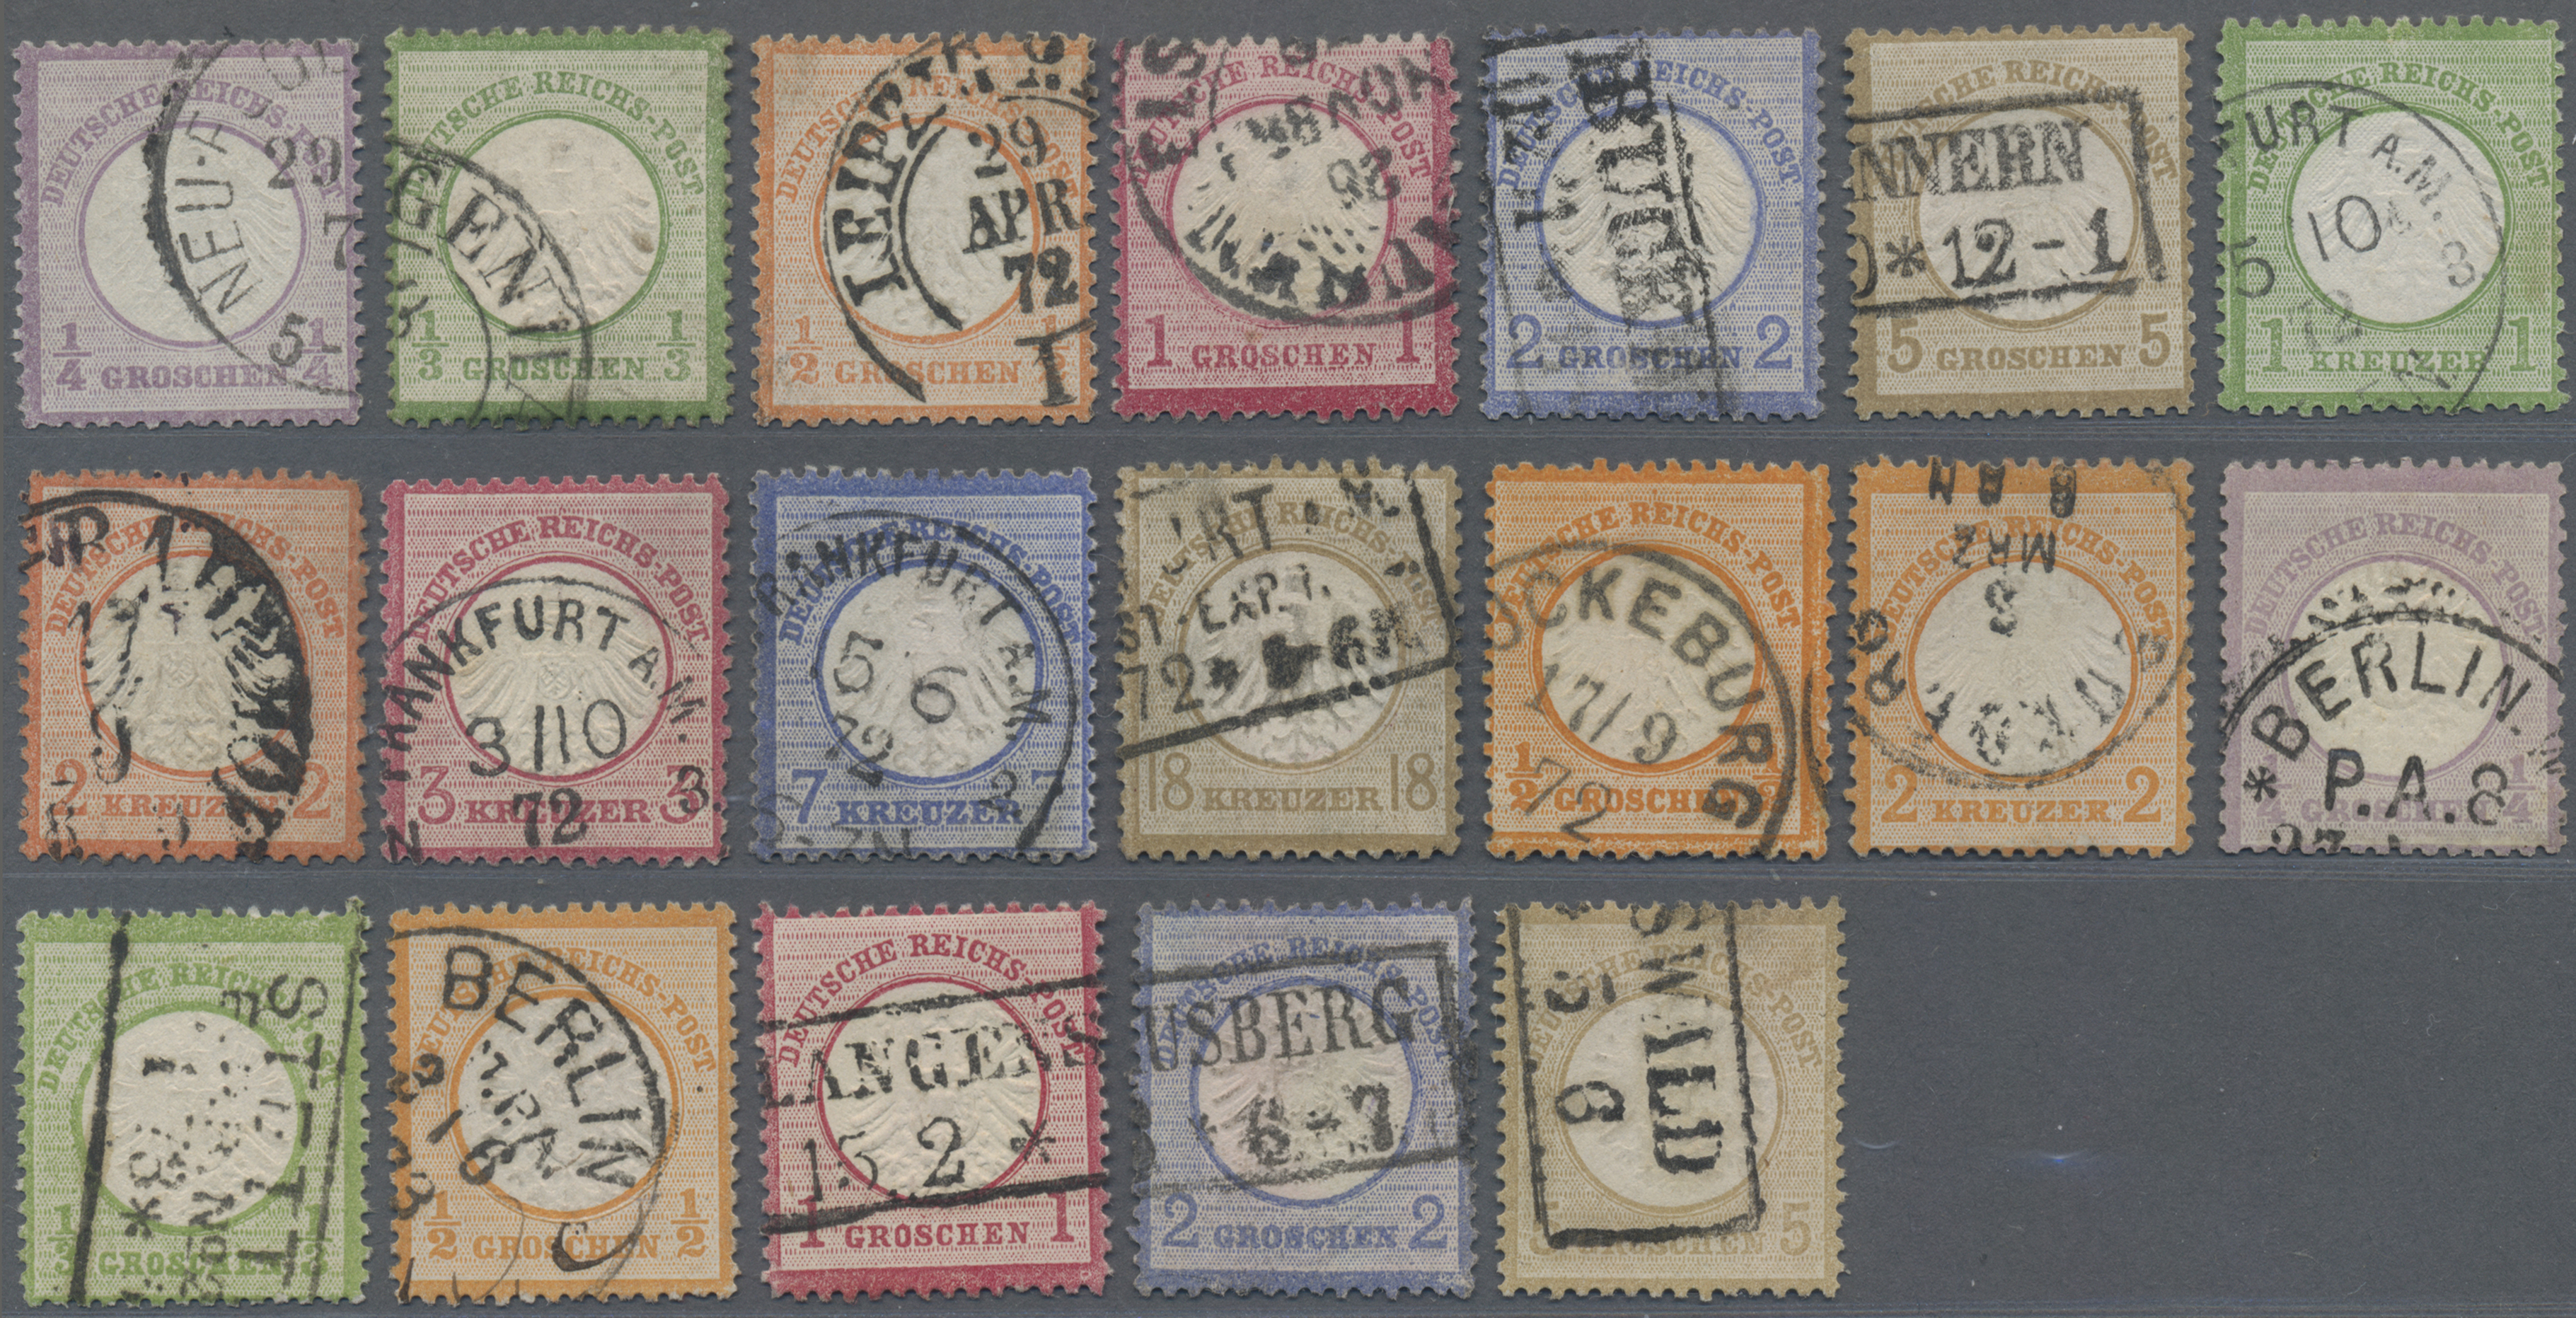 Lot 22104 - nachlässe  -  Auktionshaus Christoph Gärtner GmbH & Co. KG Sale #49 Collections Overseas, Thematics, Europe, Germany/Estates